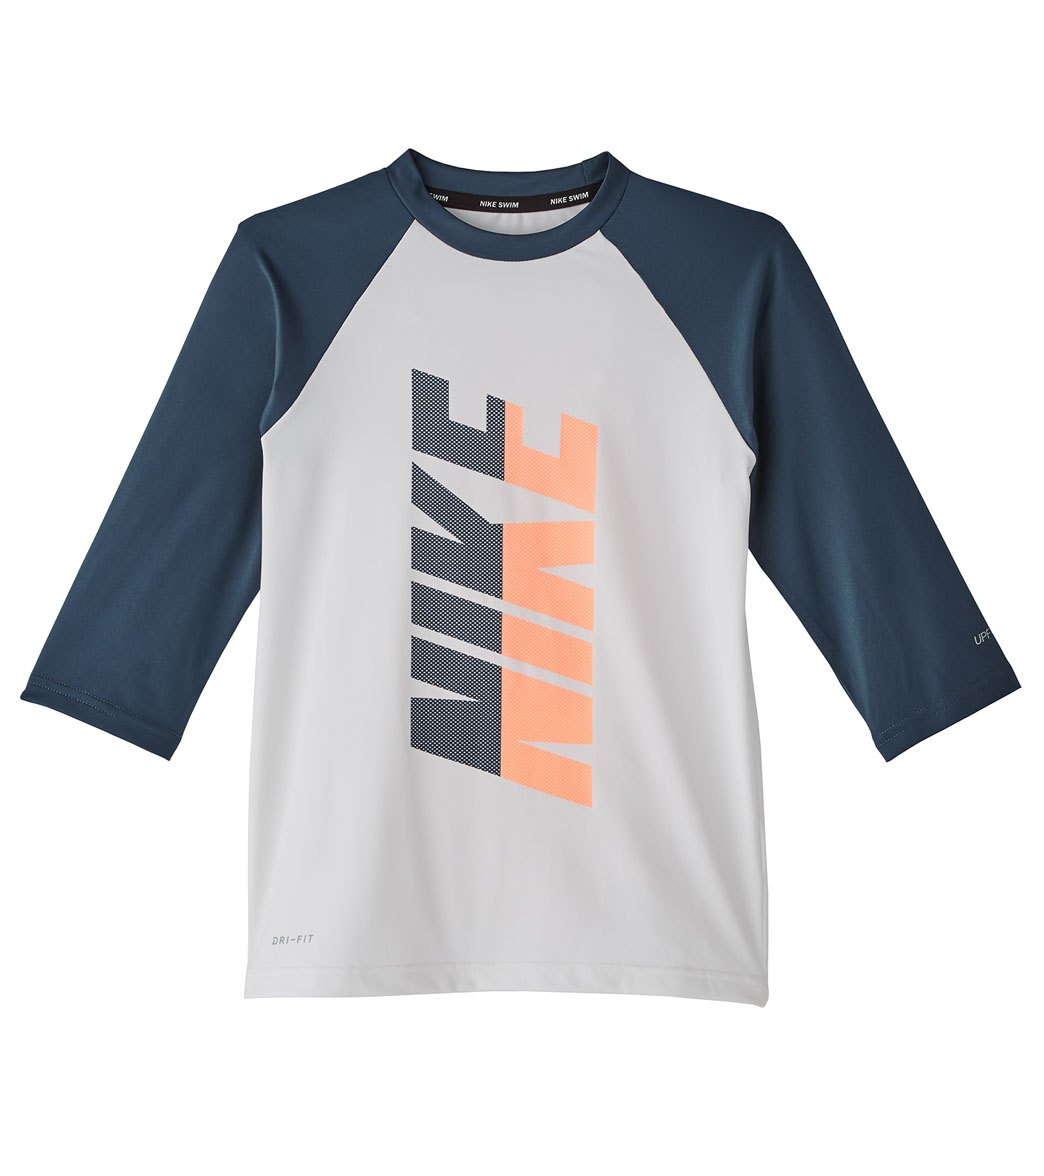 36c8aec38 Nike Girls' Rift 3/4 Sleeve Hydroguard Rash Guard (Big Kid) at ...